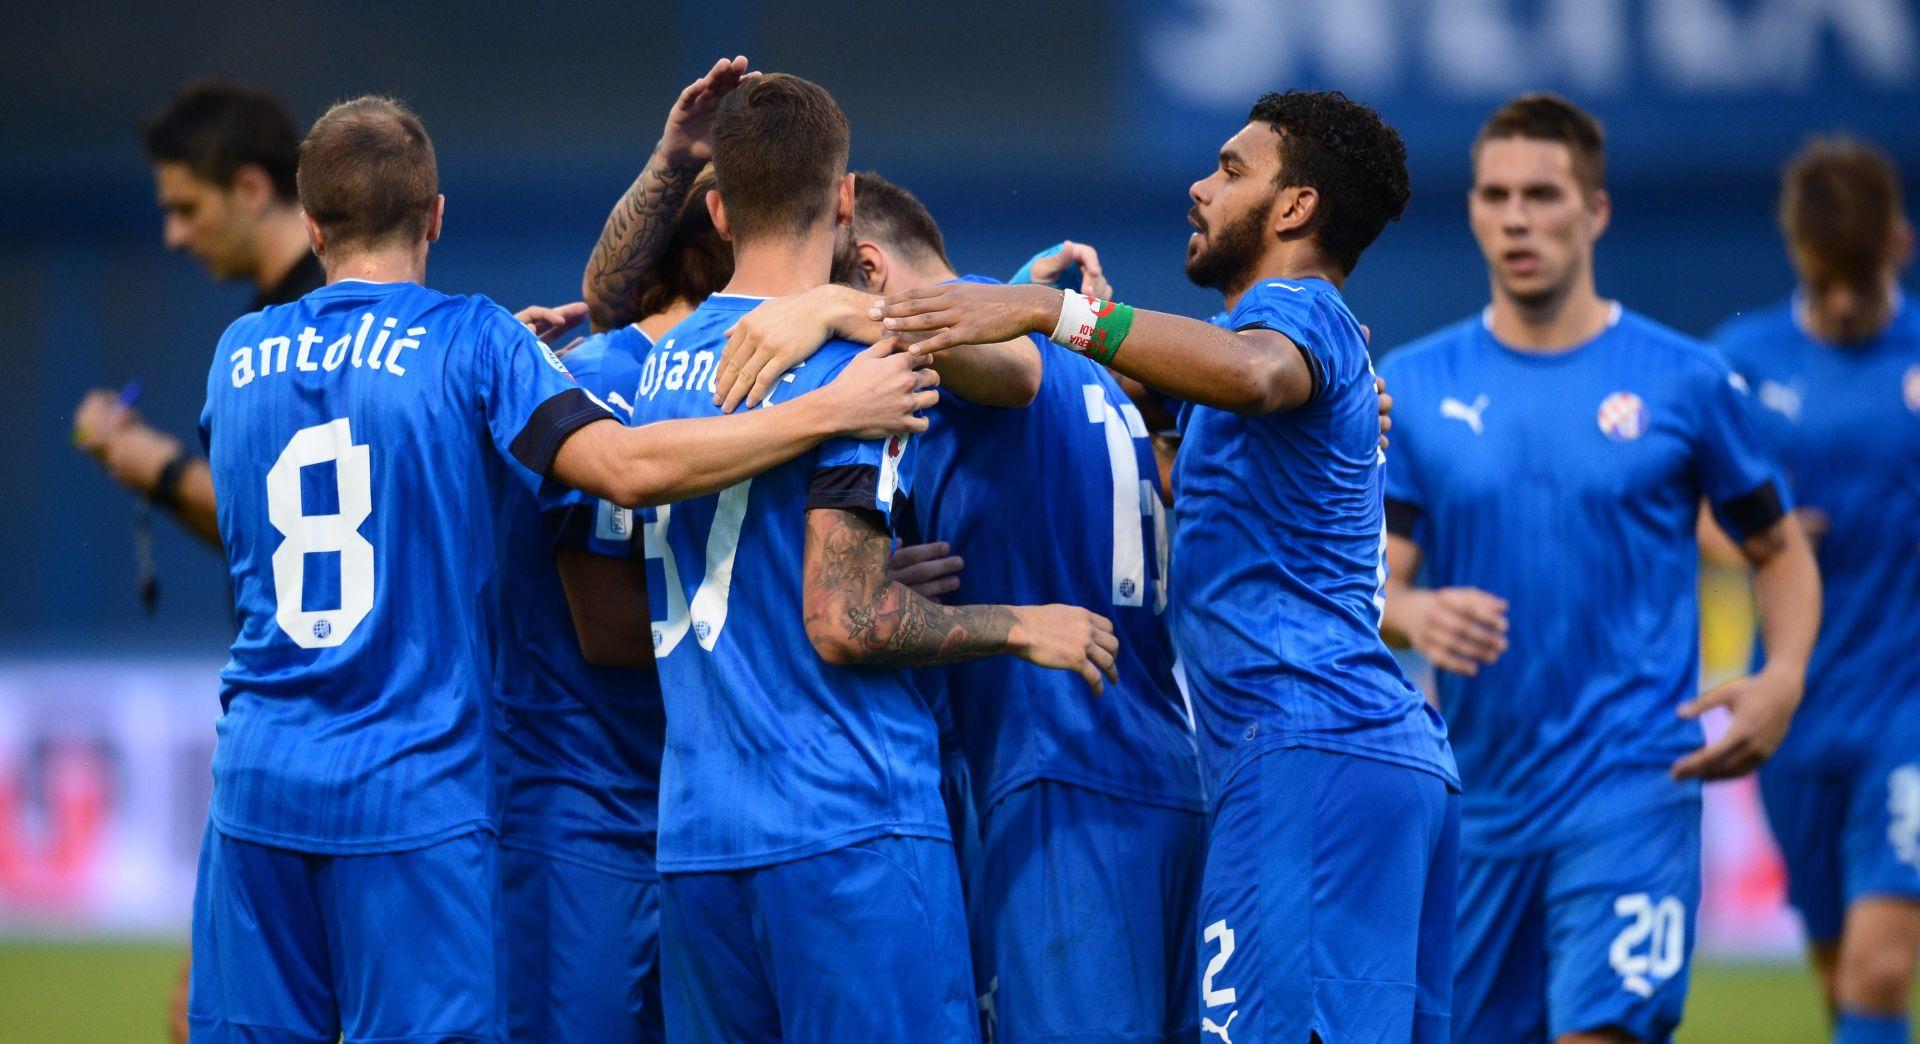 PRETKOLO LIGE PRVAKA Dinamo Tbilisi čeka zagrebački Dinamo ili Vardar